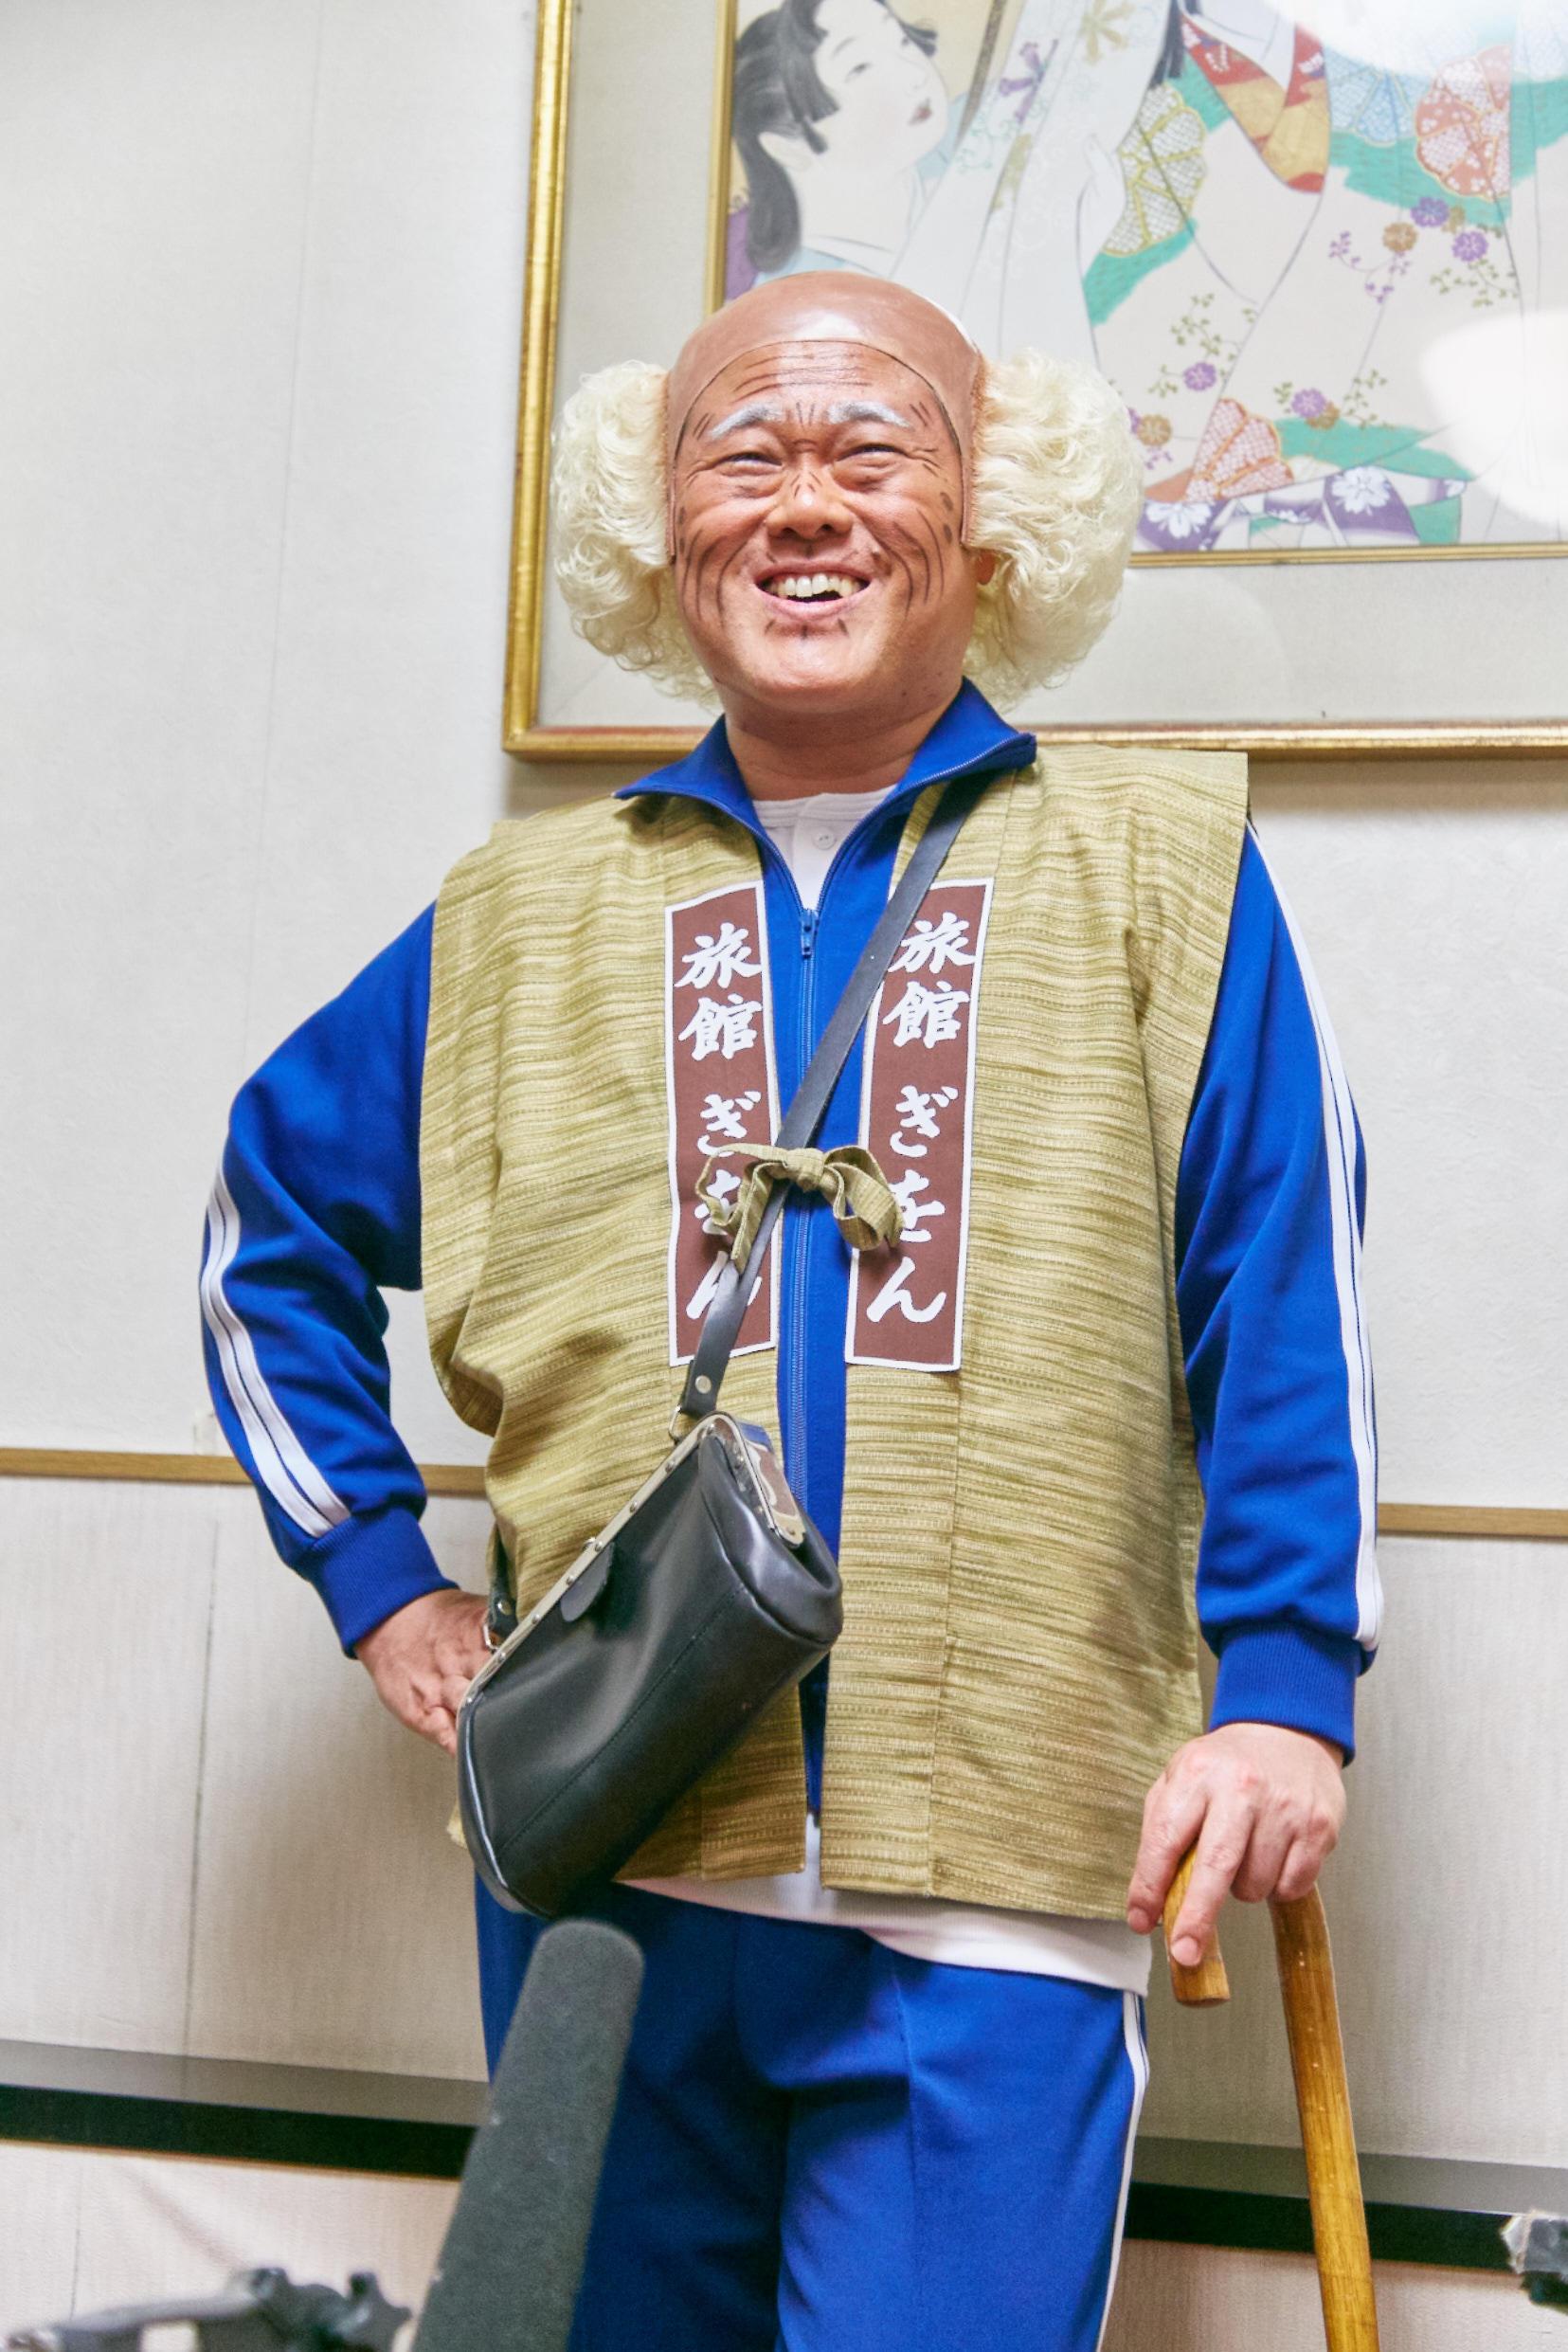 http://news.yoshimoto.co.jp/20180228003441-8f30f0849120dd54598b4c65d0f20101fc804fe9.jpg